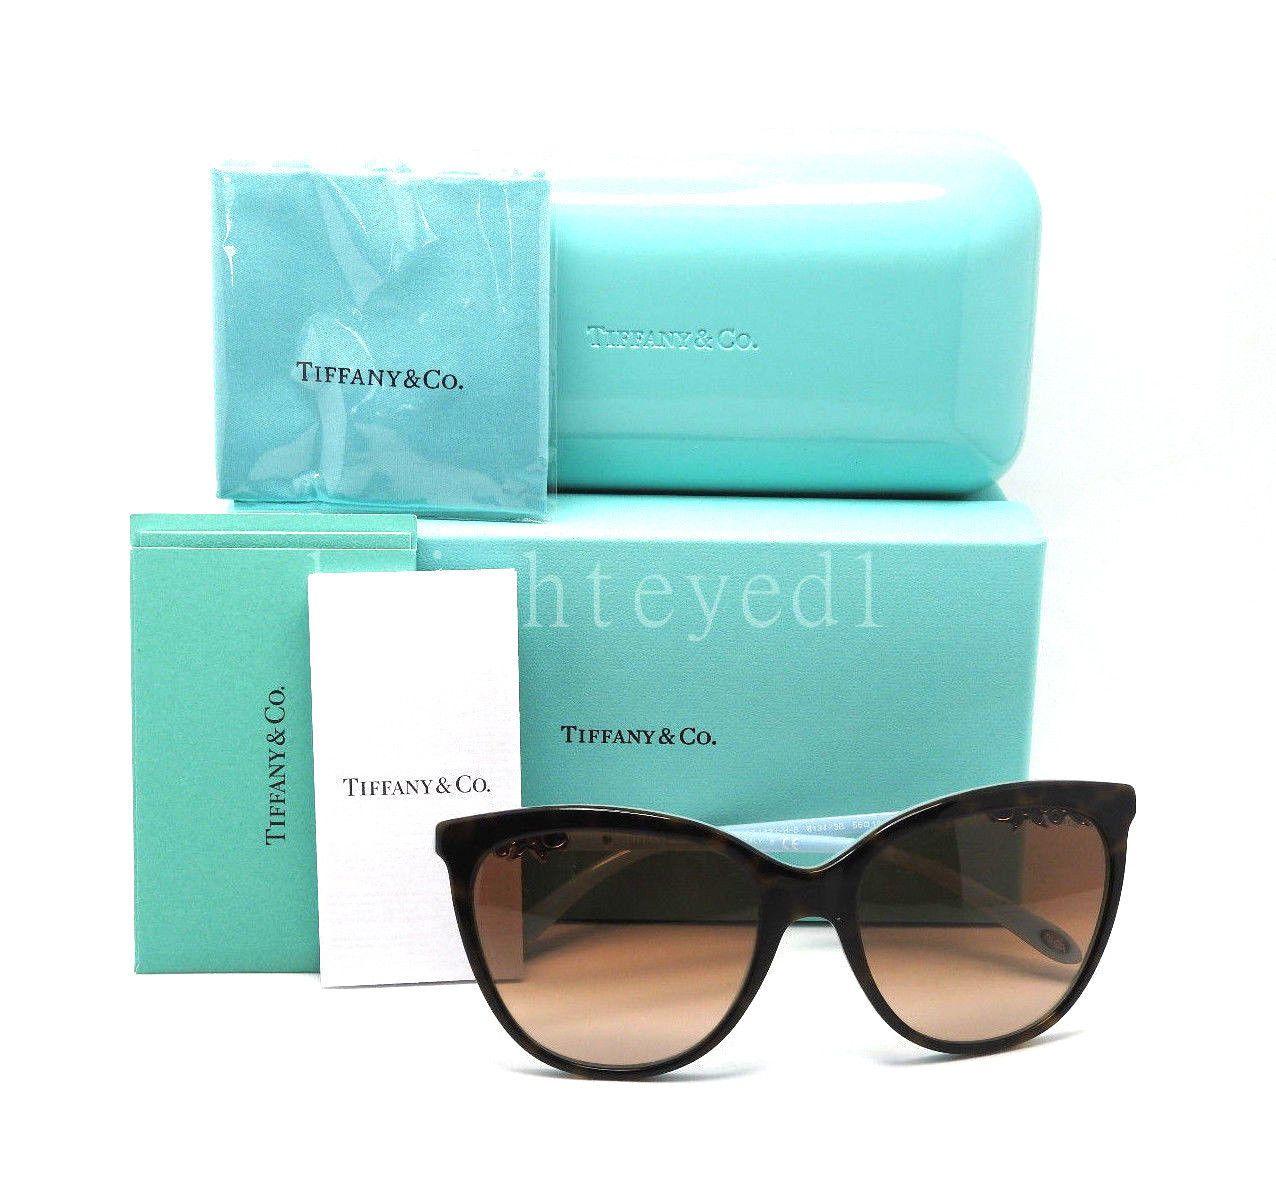 5a54b1ac4e Authentic TIFFANY   CO. Victoria Cat Eye Sunglasses TF 4131HB - 81343B   NEW  4